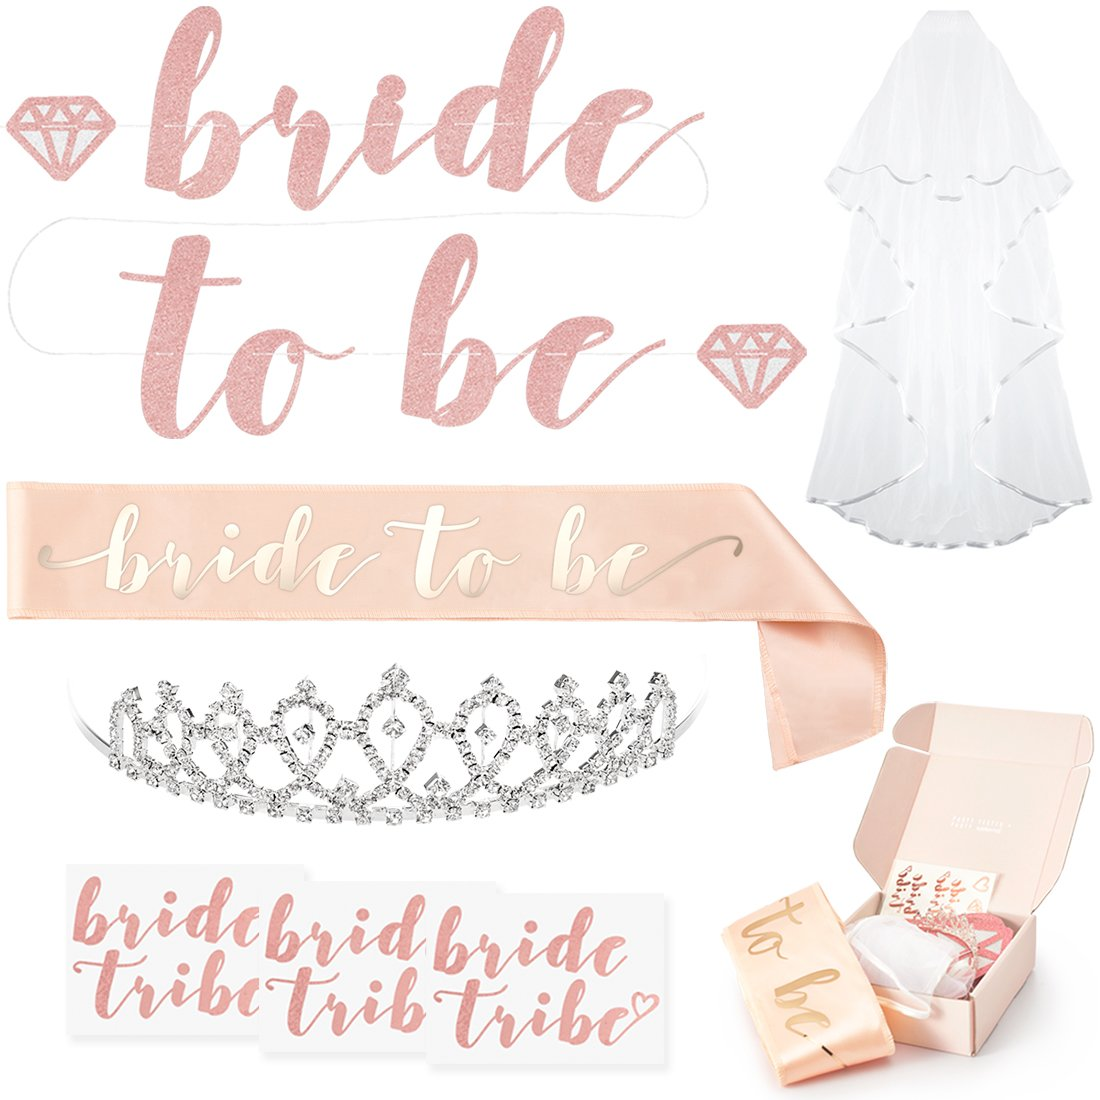 xo, Fetti Rose Gold Pink Bachelorette Party Decorations Kit - Bridal Shower Supplies | Bride to Be Sash, Rhinestone Tiara, Pre-Strung Banner, Veil + Bride Tribe Flash Tattoos by xo, Fetti